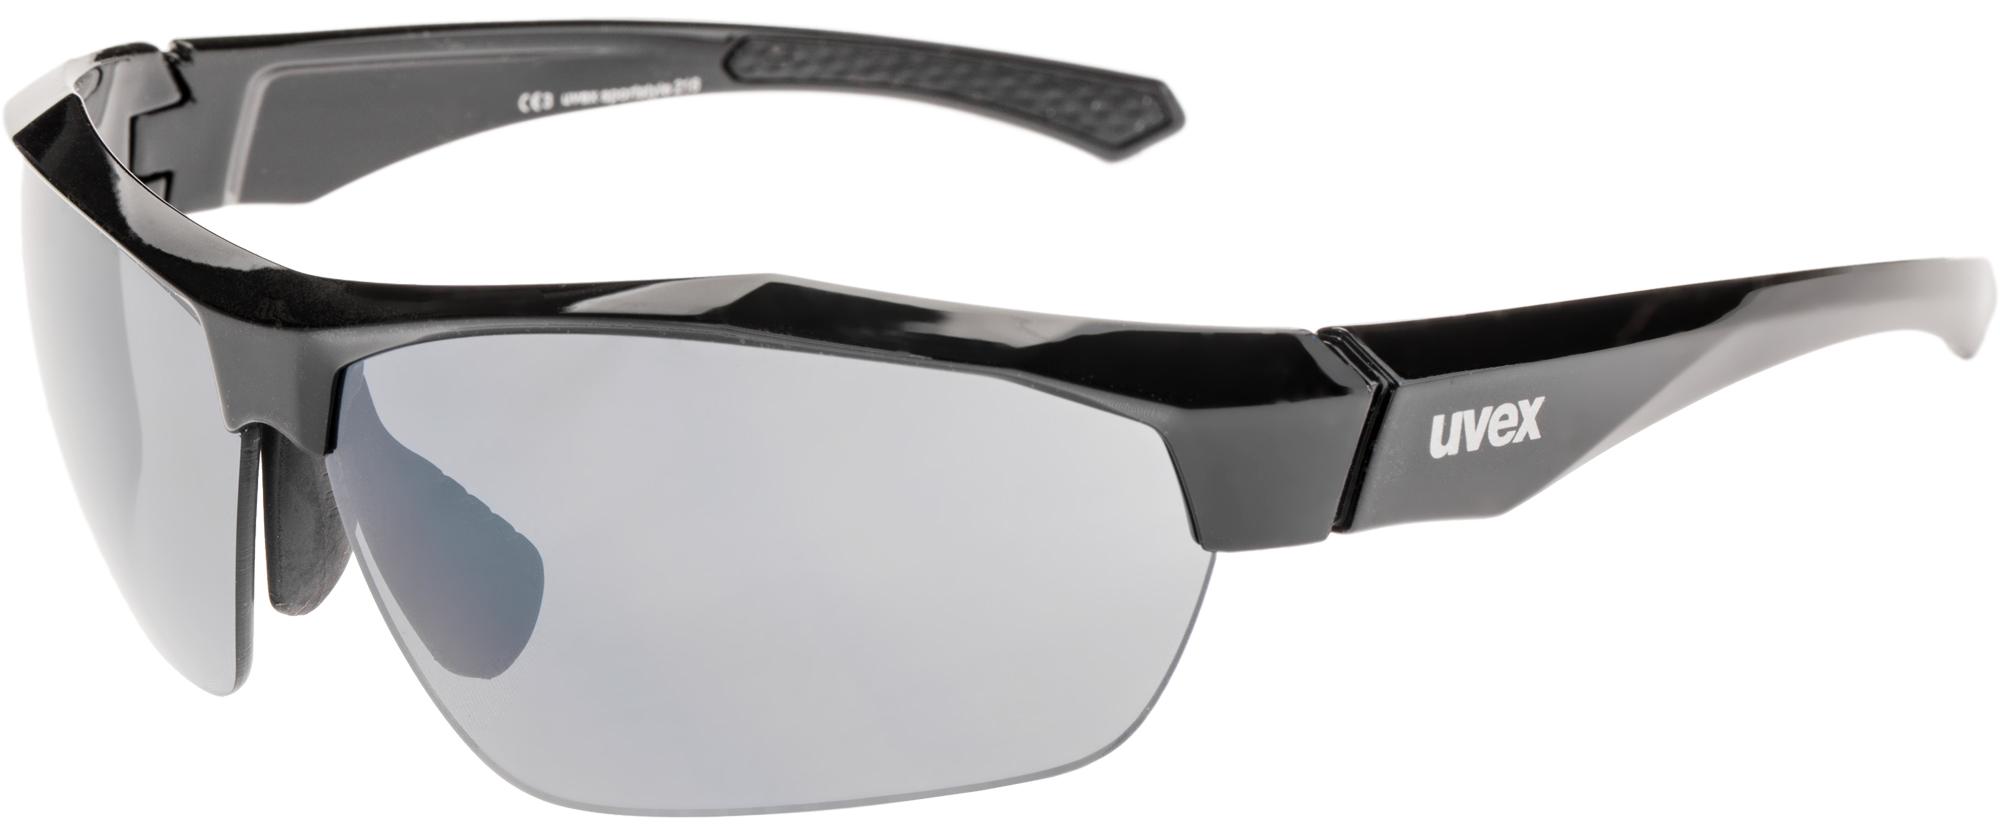 Uvex Солнцезащитные очки Uvex uvex очки детские